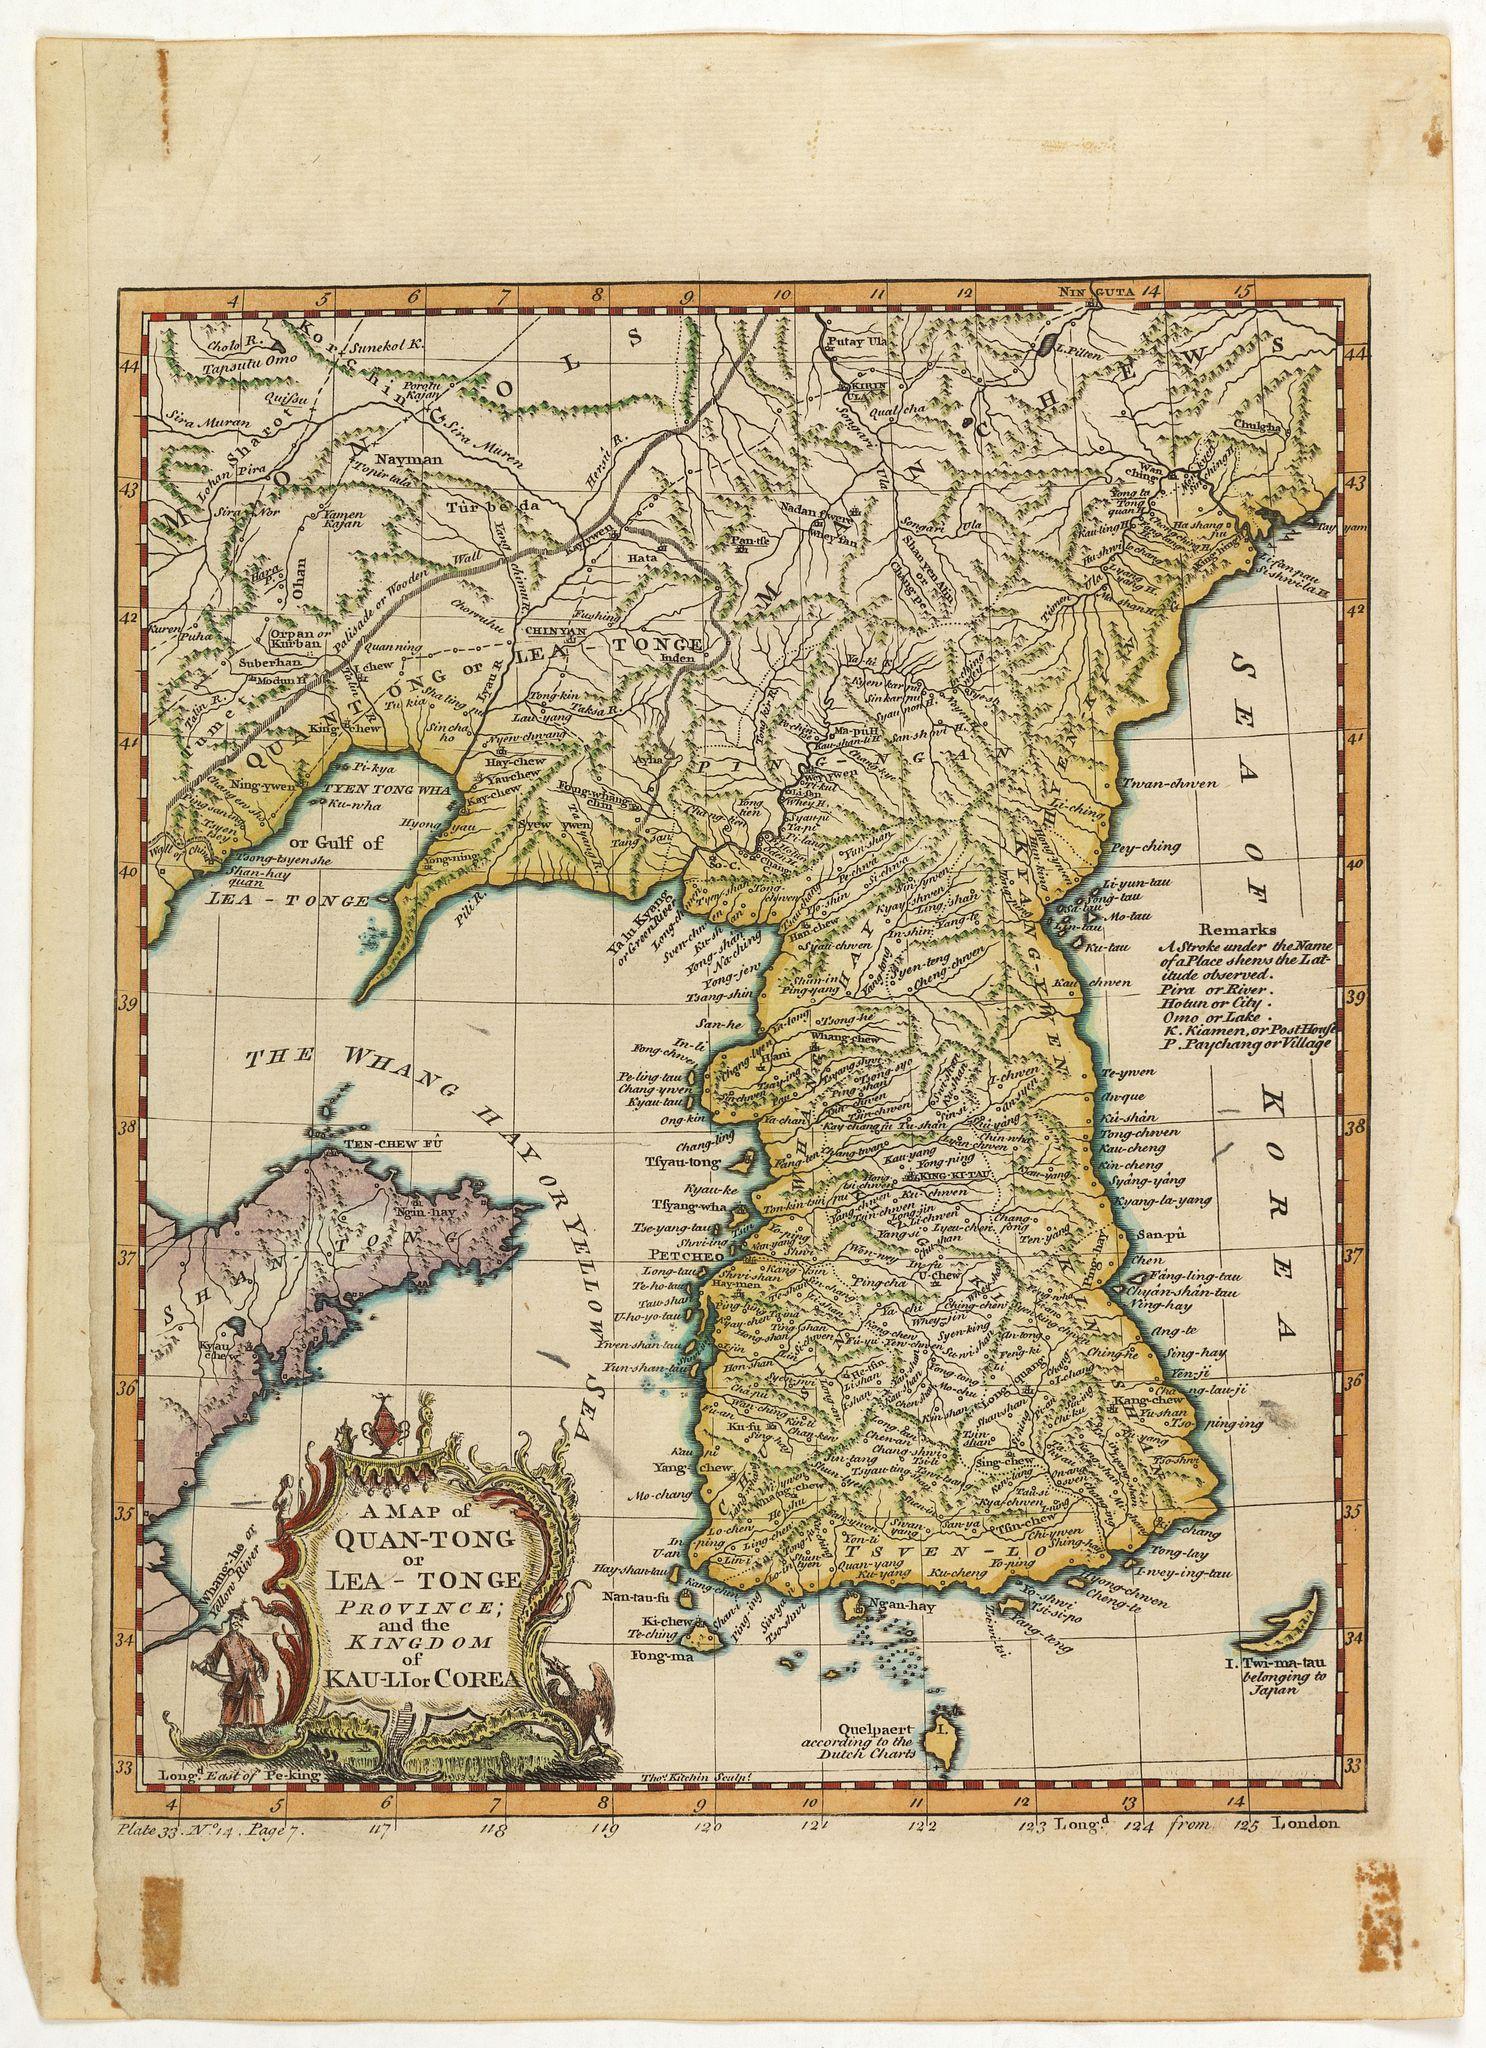 KITCHIN, Th. -  A map of Quan-Tonge province and the kingdom of Kau-Li or Korea.